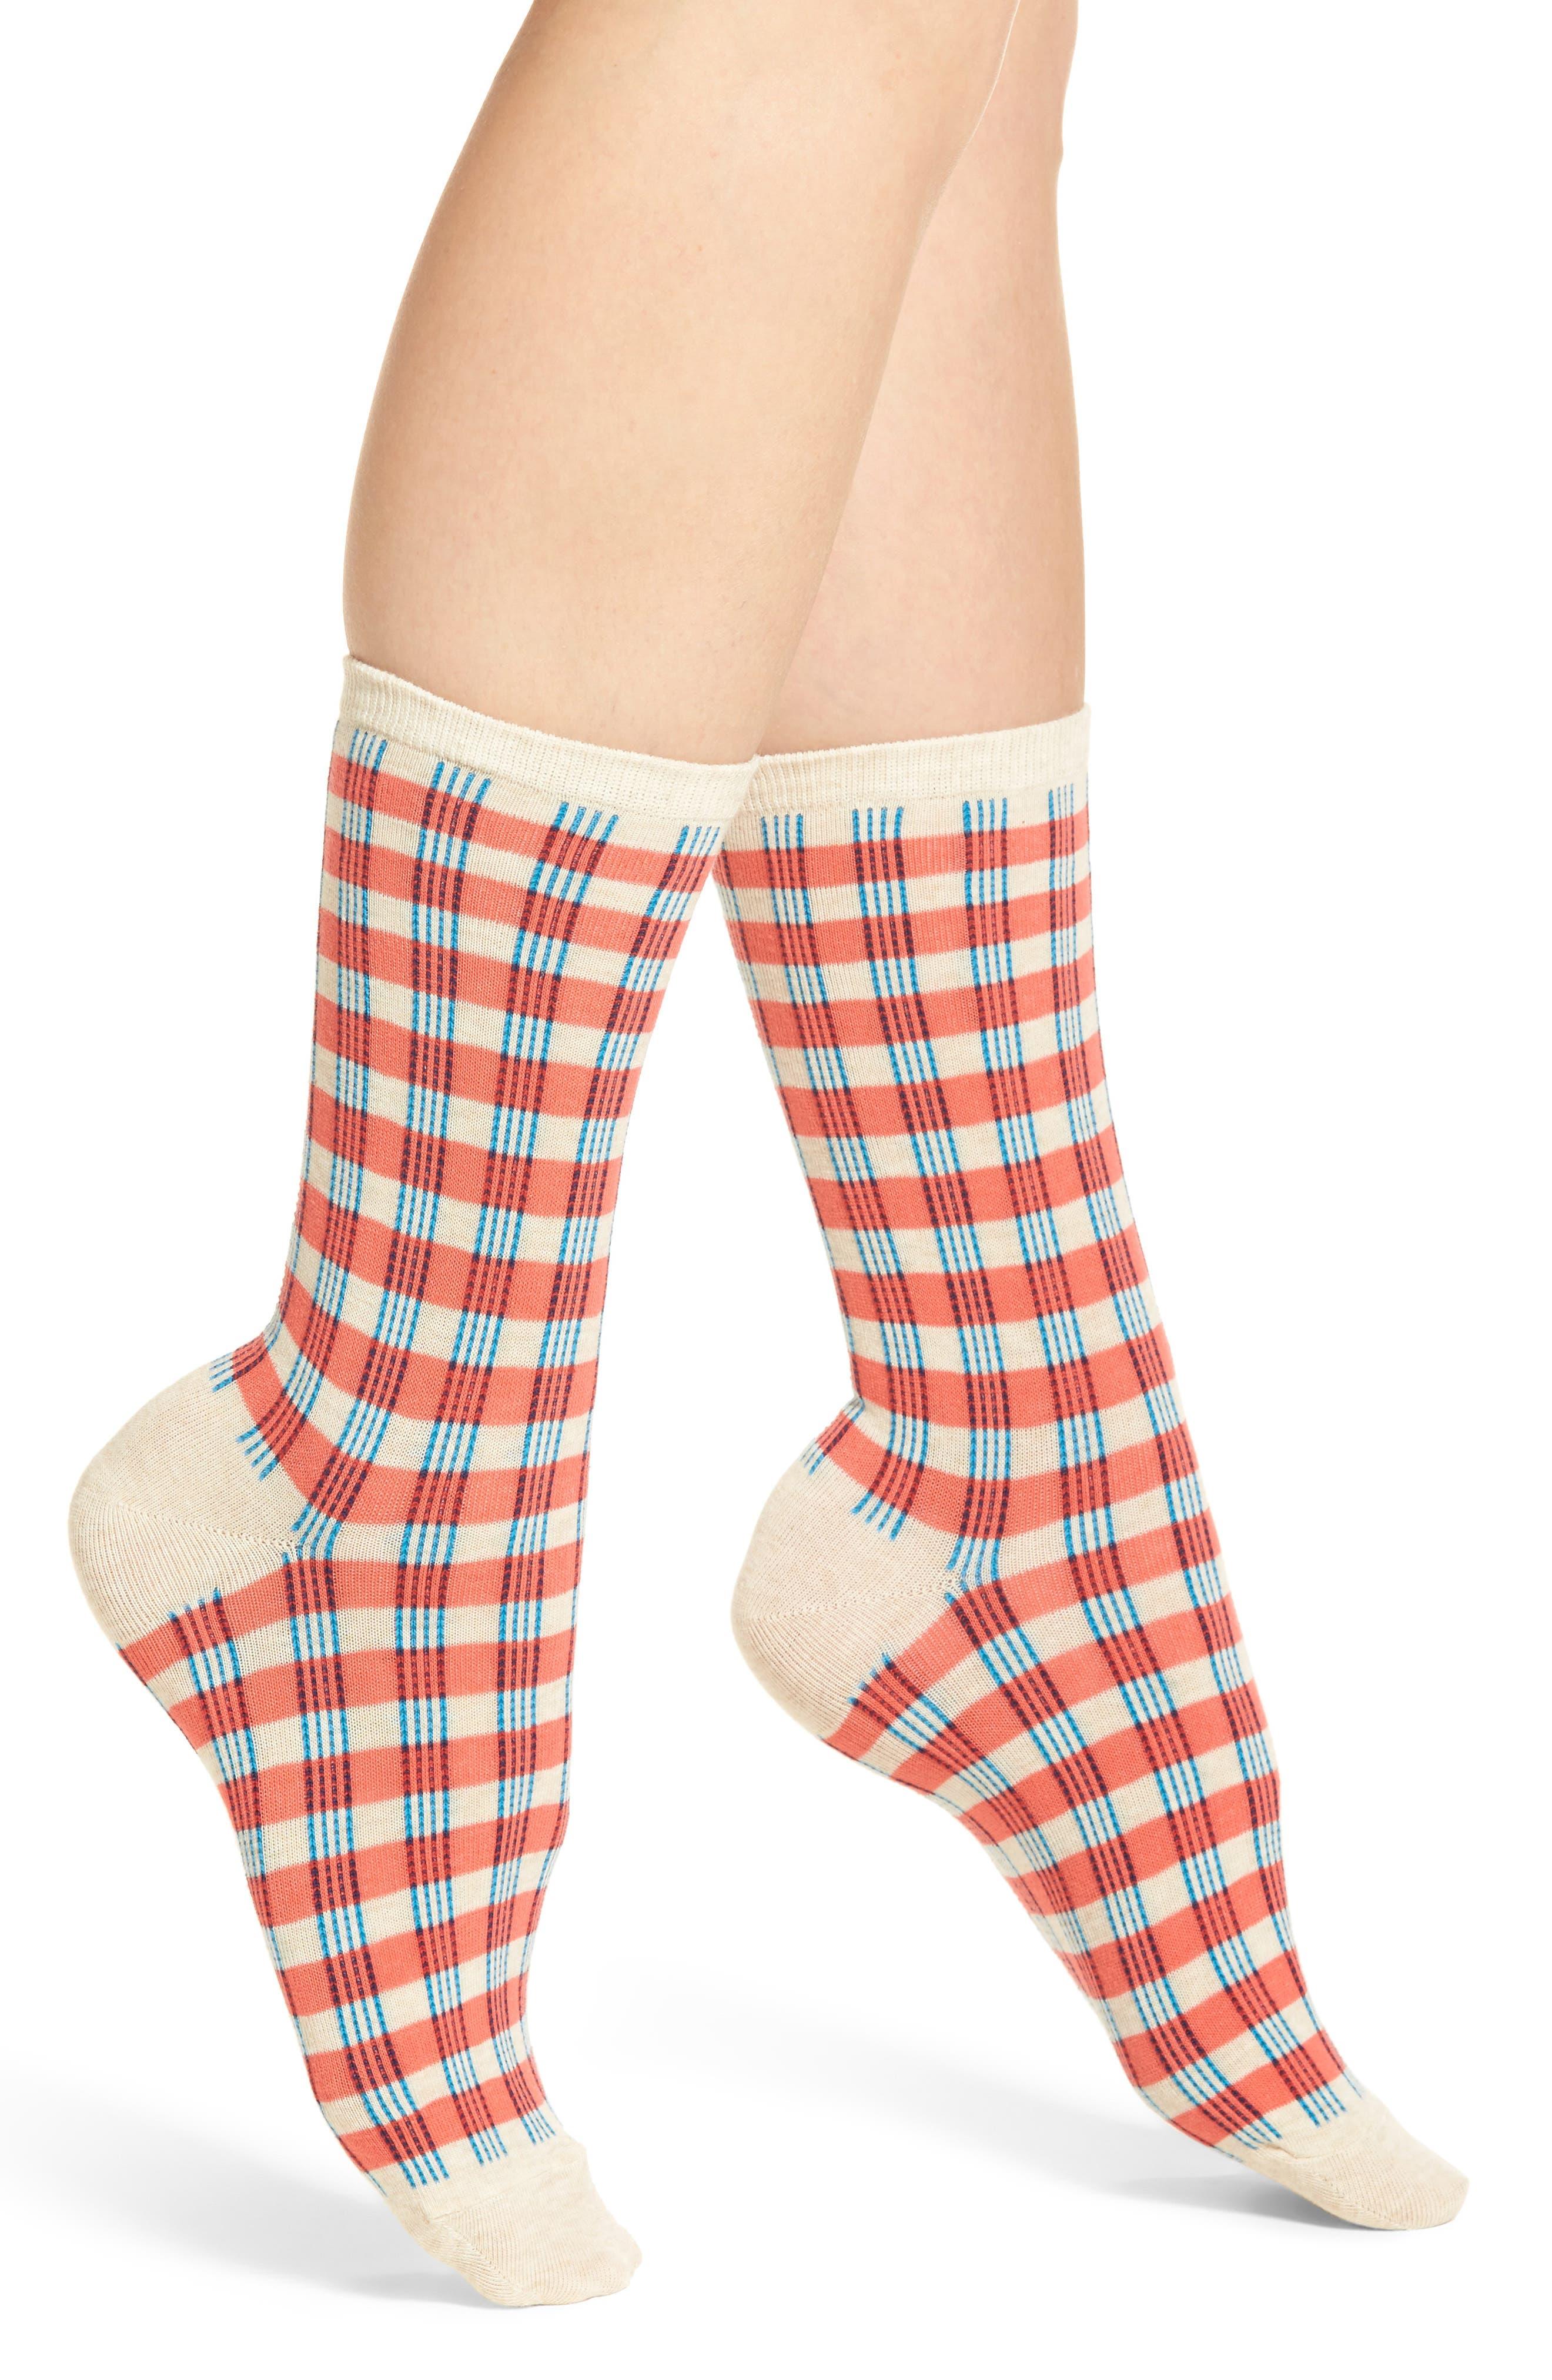 Hot Sox Gingham Crew Socks